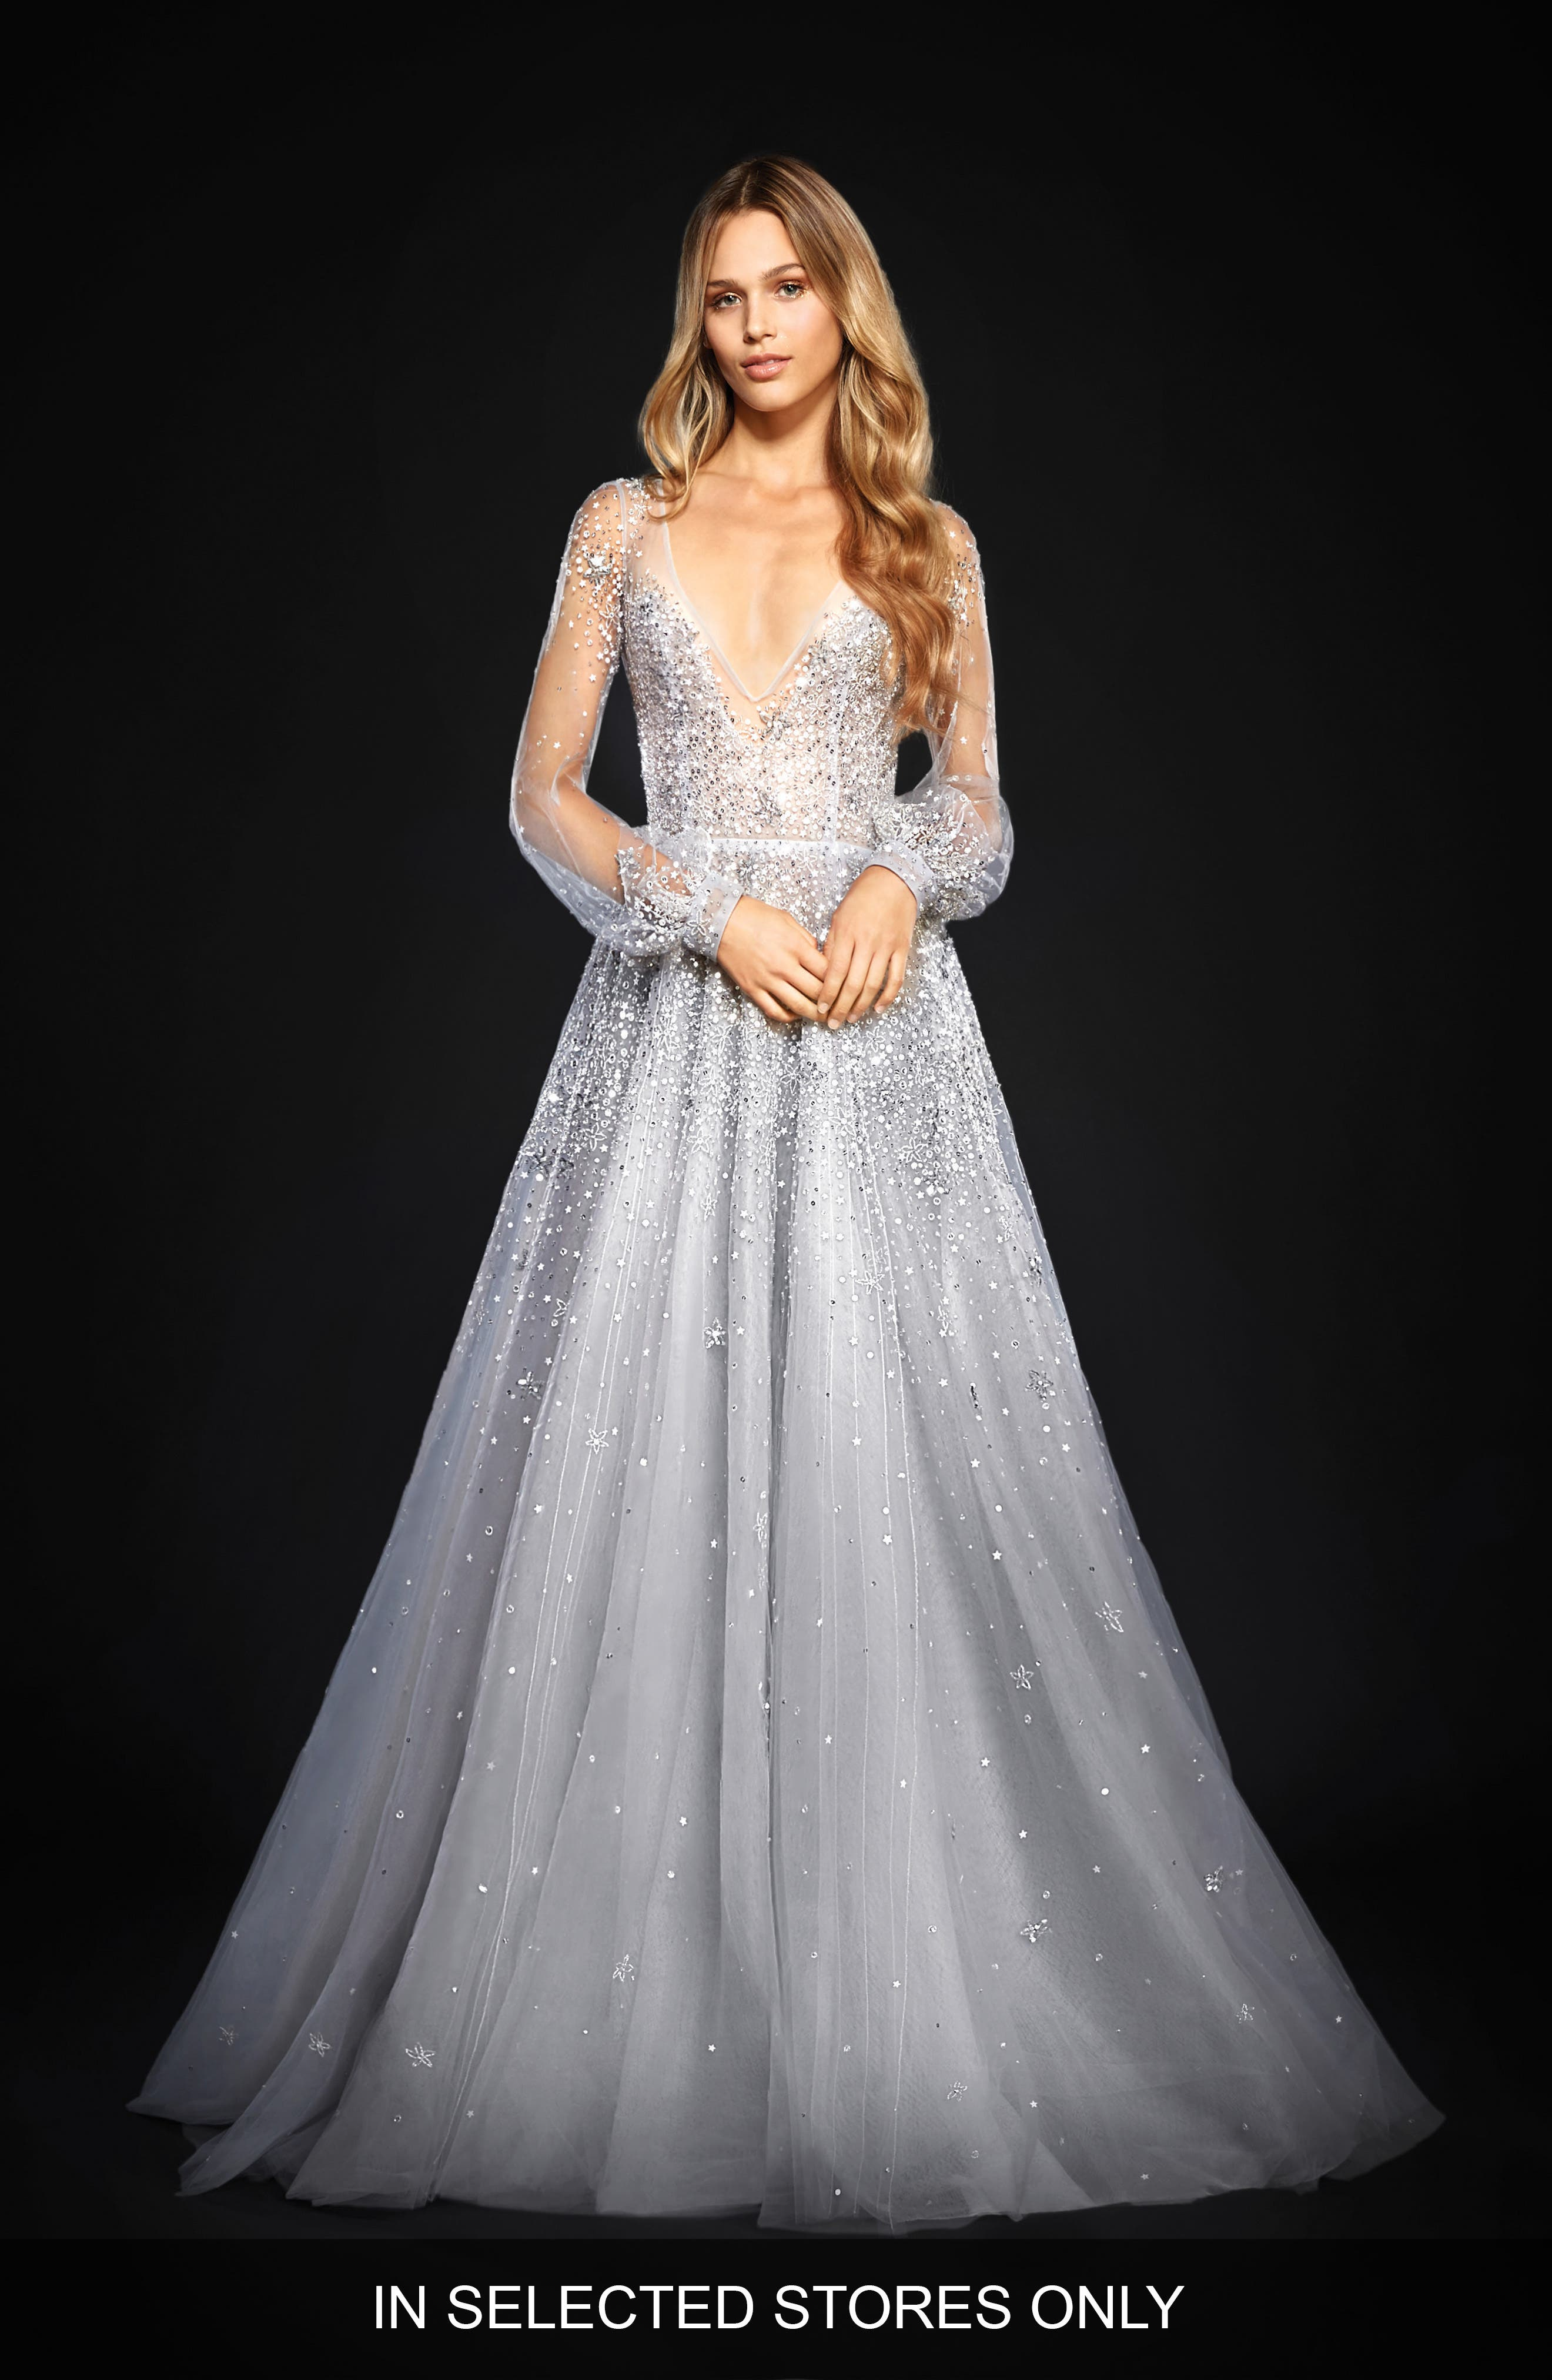 Main Image - Hayley Paige Lumi Embellished Long Sleeve Tulle Ballgown